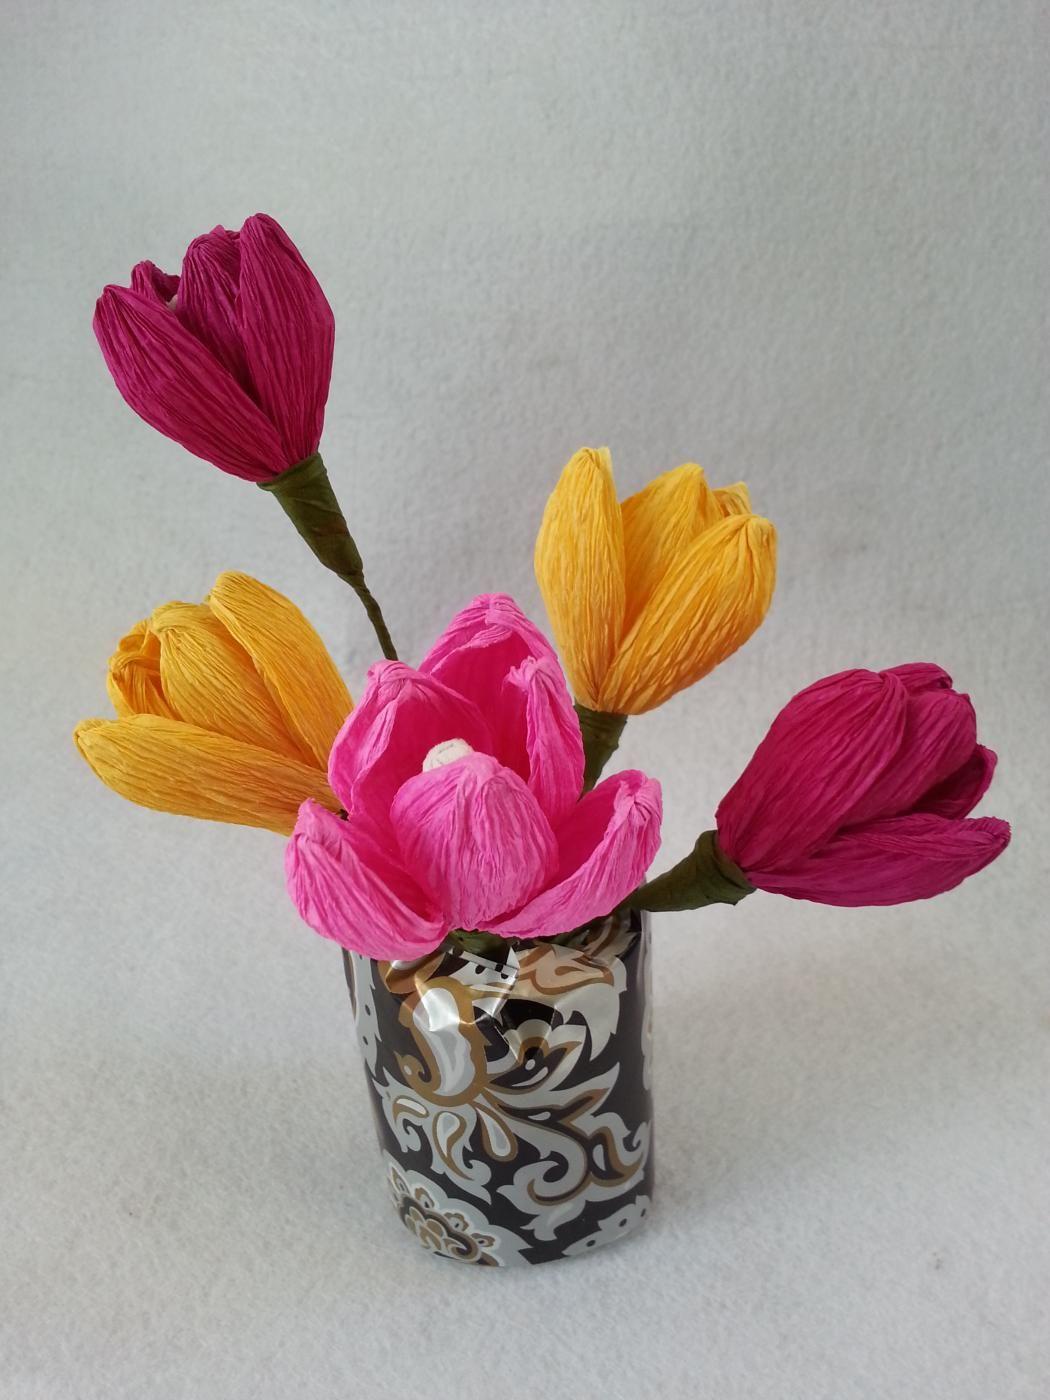 Diy Crepe Paper Tulip Flowers Crepe Paper Crpes And Tulips Flowers